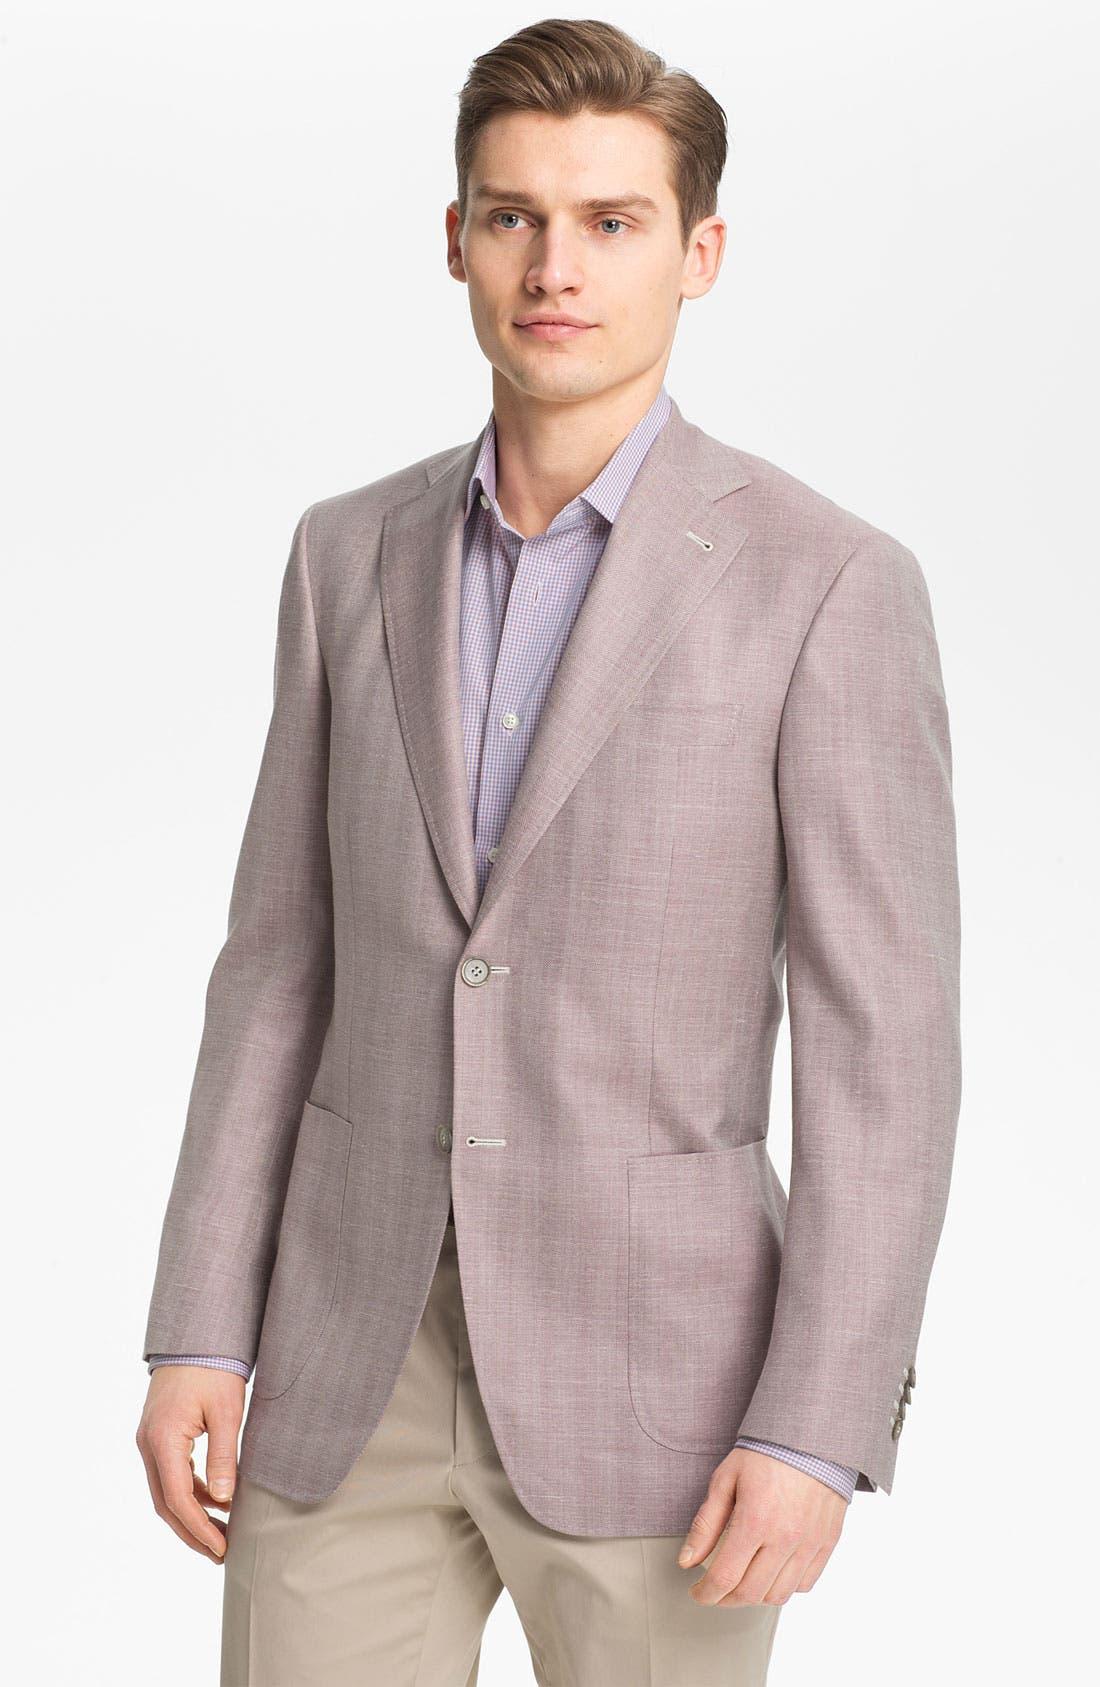 Alternate Image 1 Selected - Canali Herringbone Sportcoat